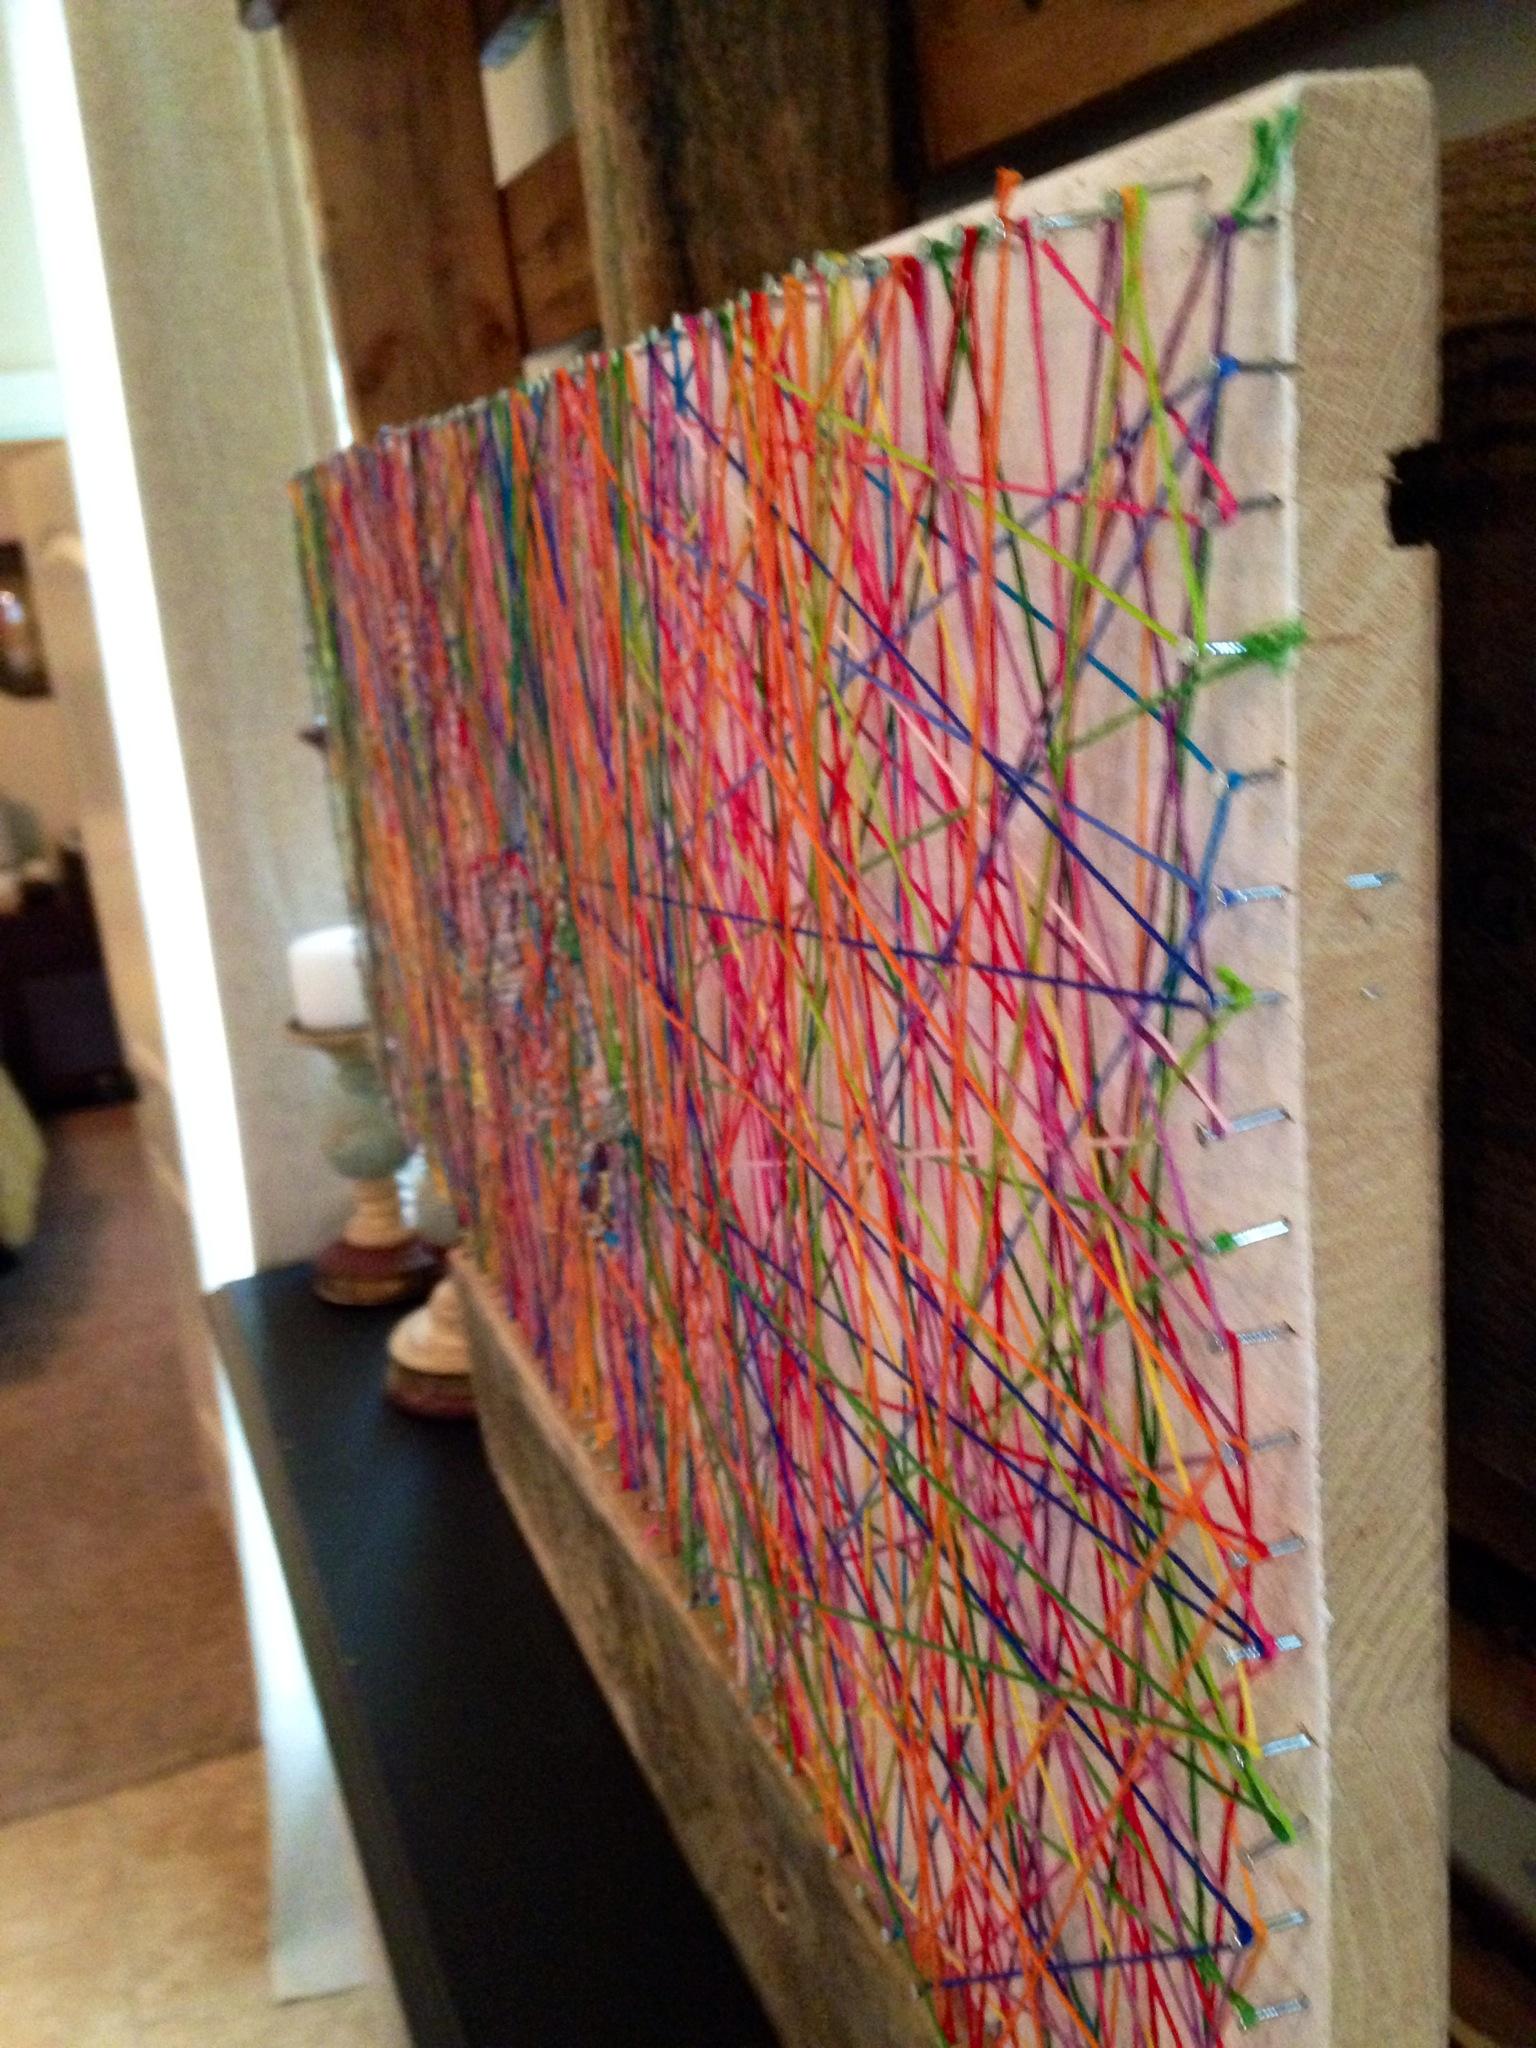 Wfmw Diy Inspiring String Art We Are That Family